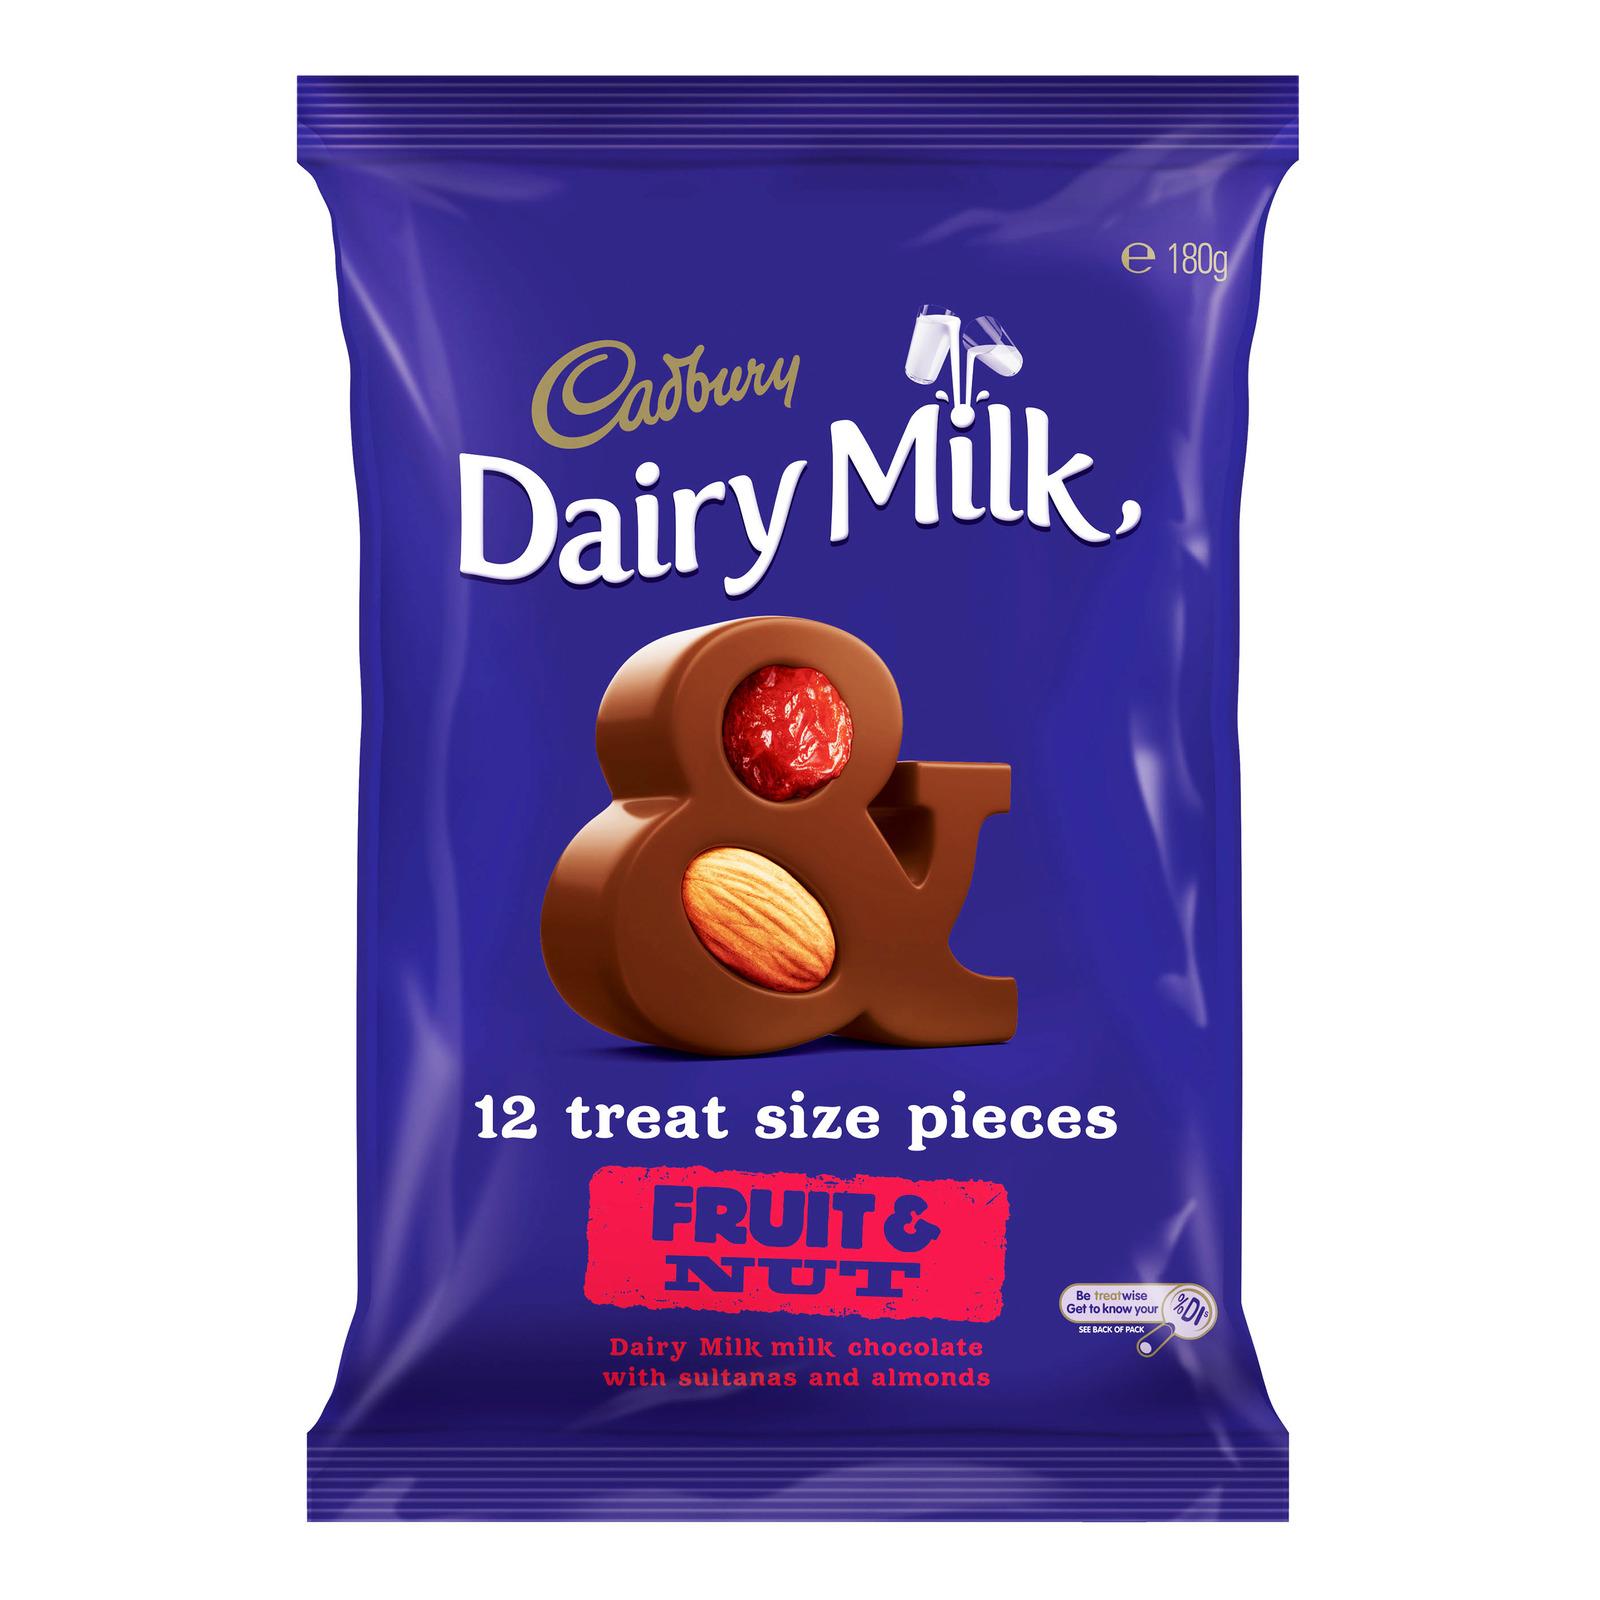 Cadbury Dairy Milk Chocolate Sharepack -Fruit&Nut